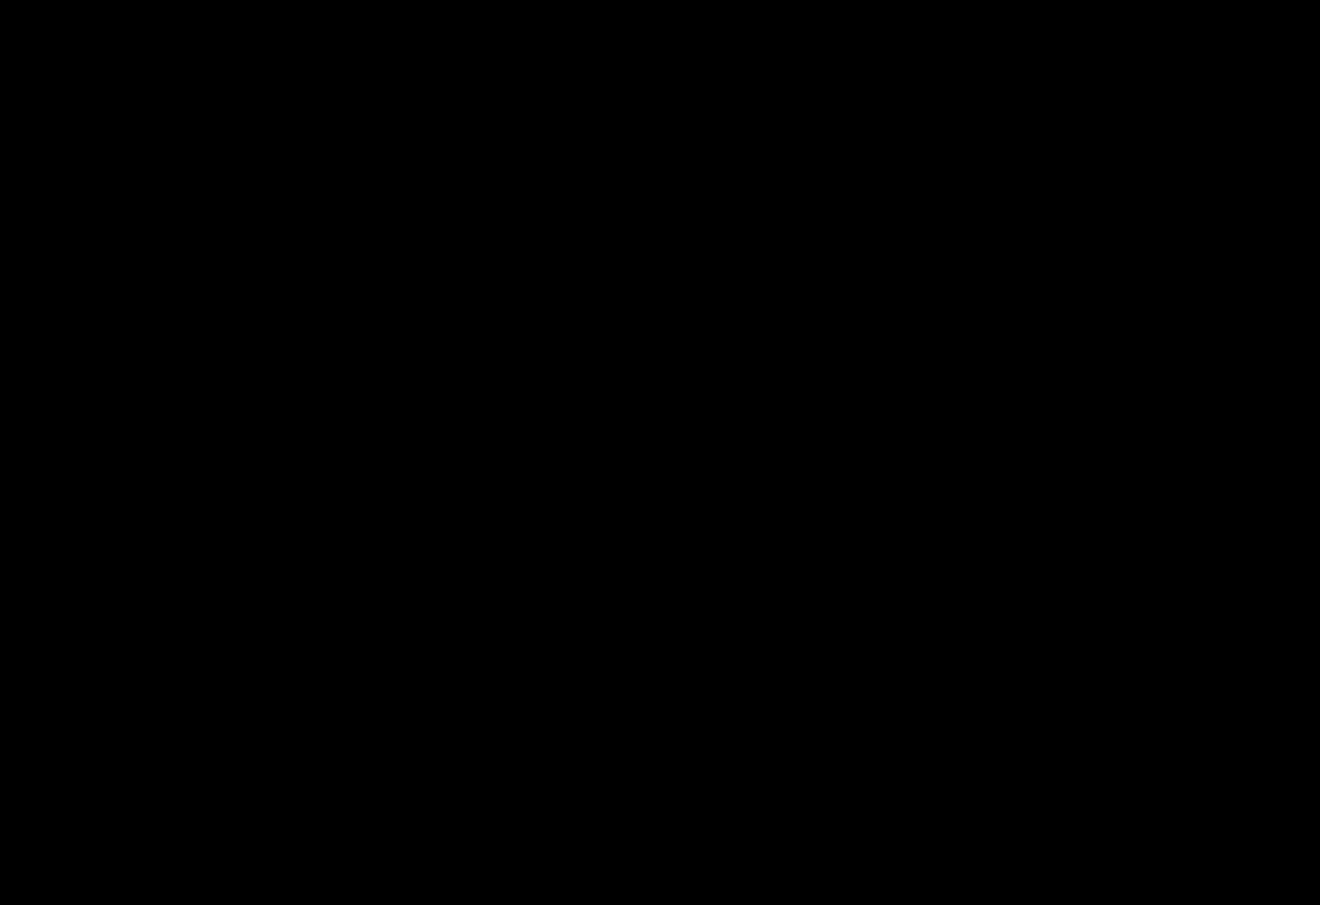 preloved-window-sticker.png